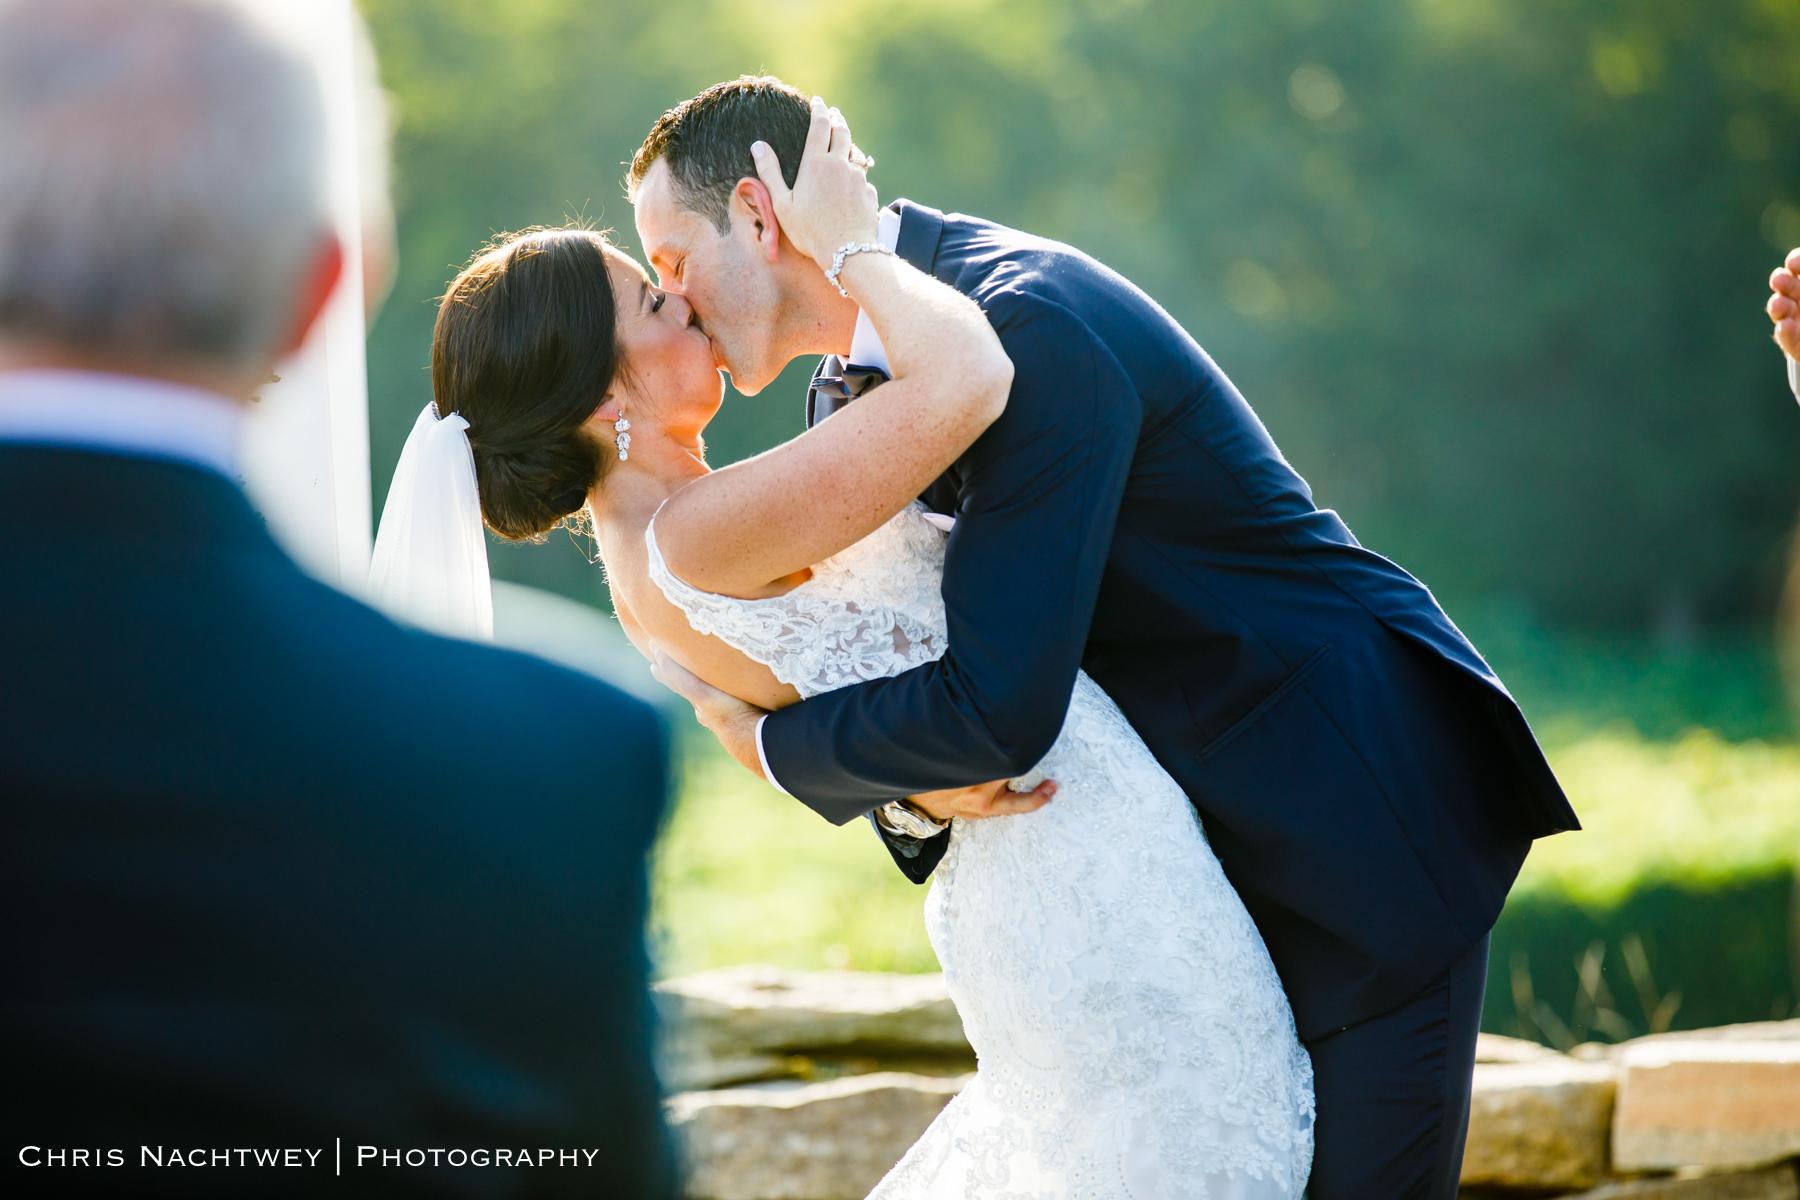 wedding-lake-of-isles-photos-chris-nachtwey-photography-2019-36.jpg